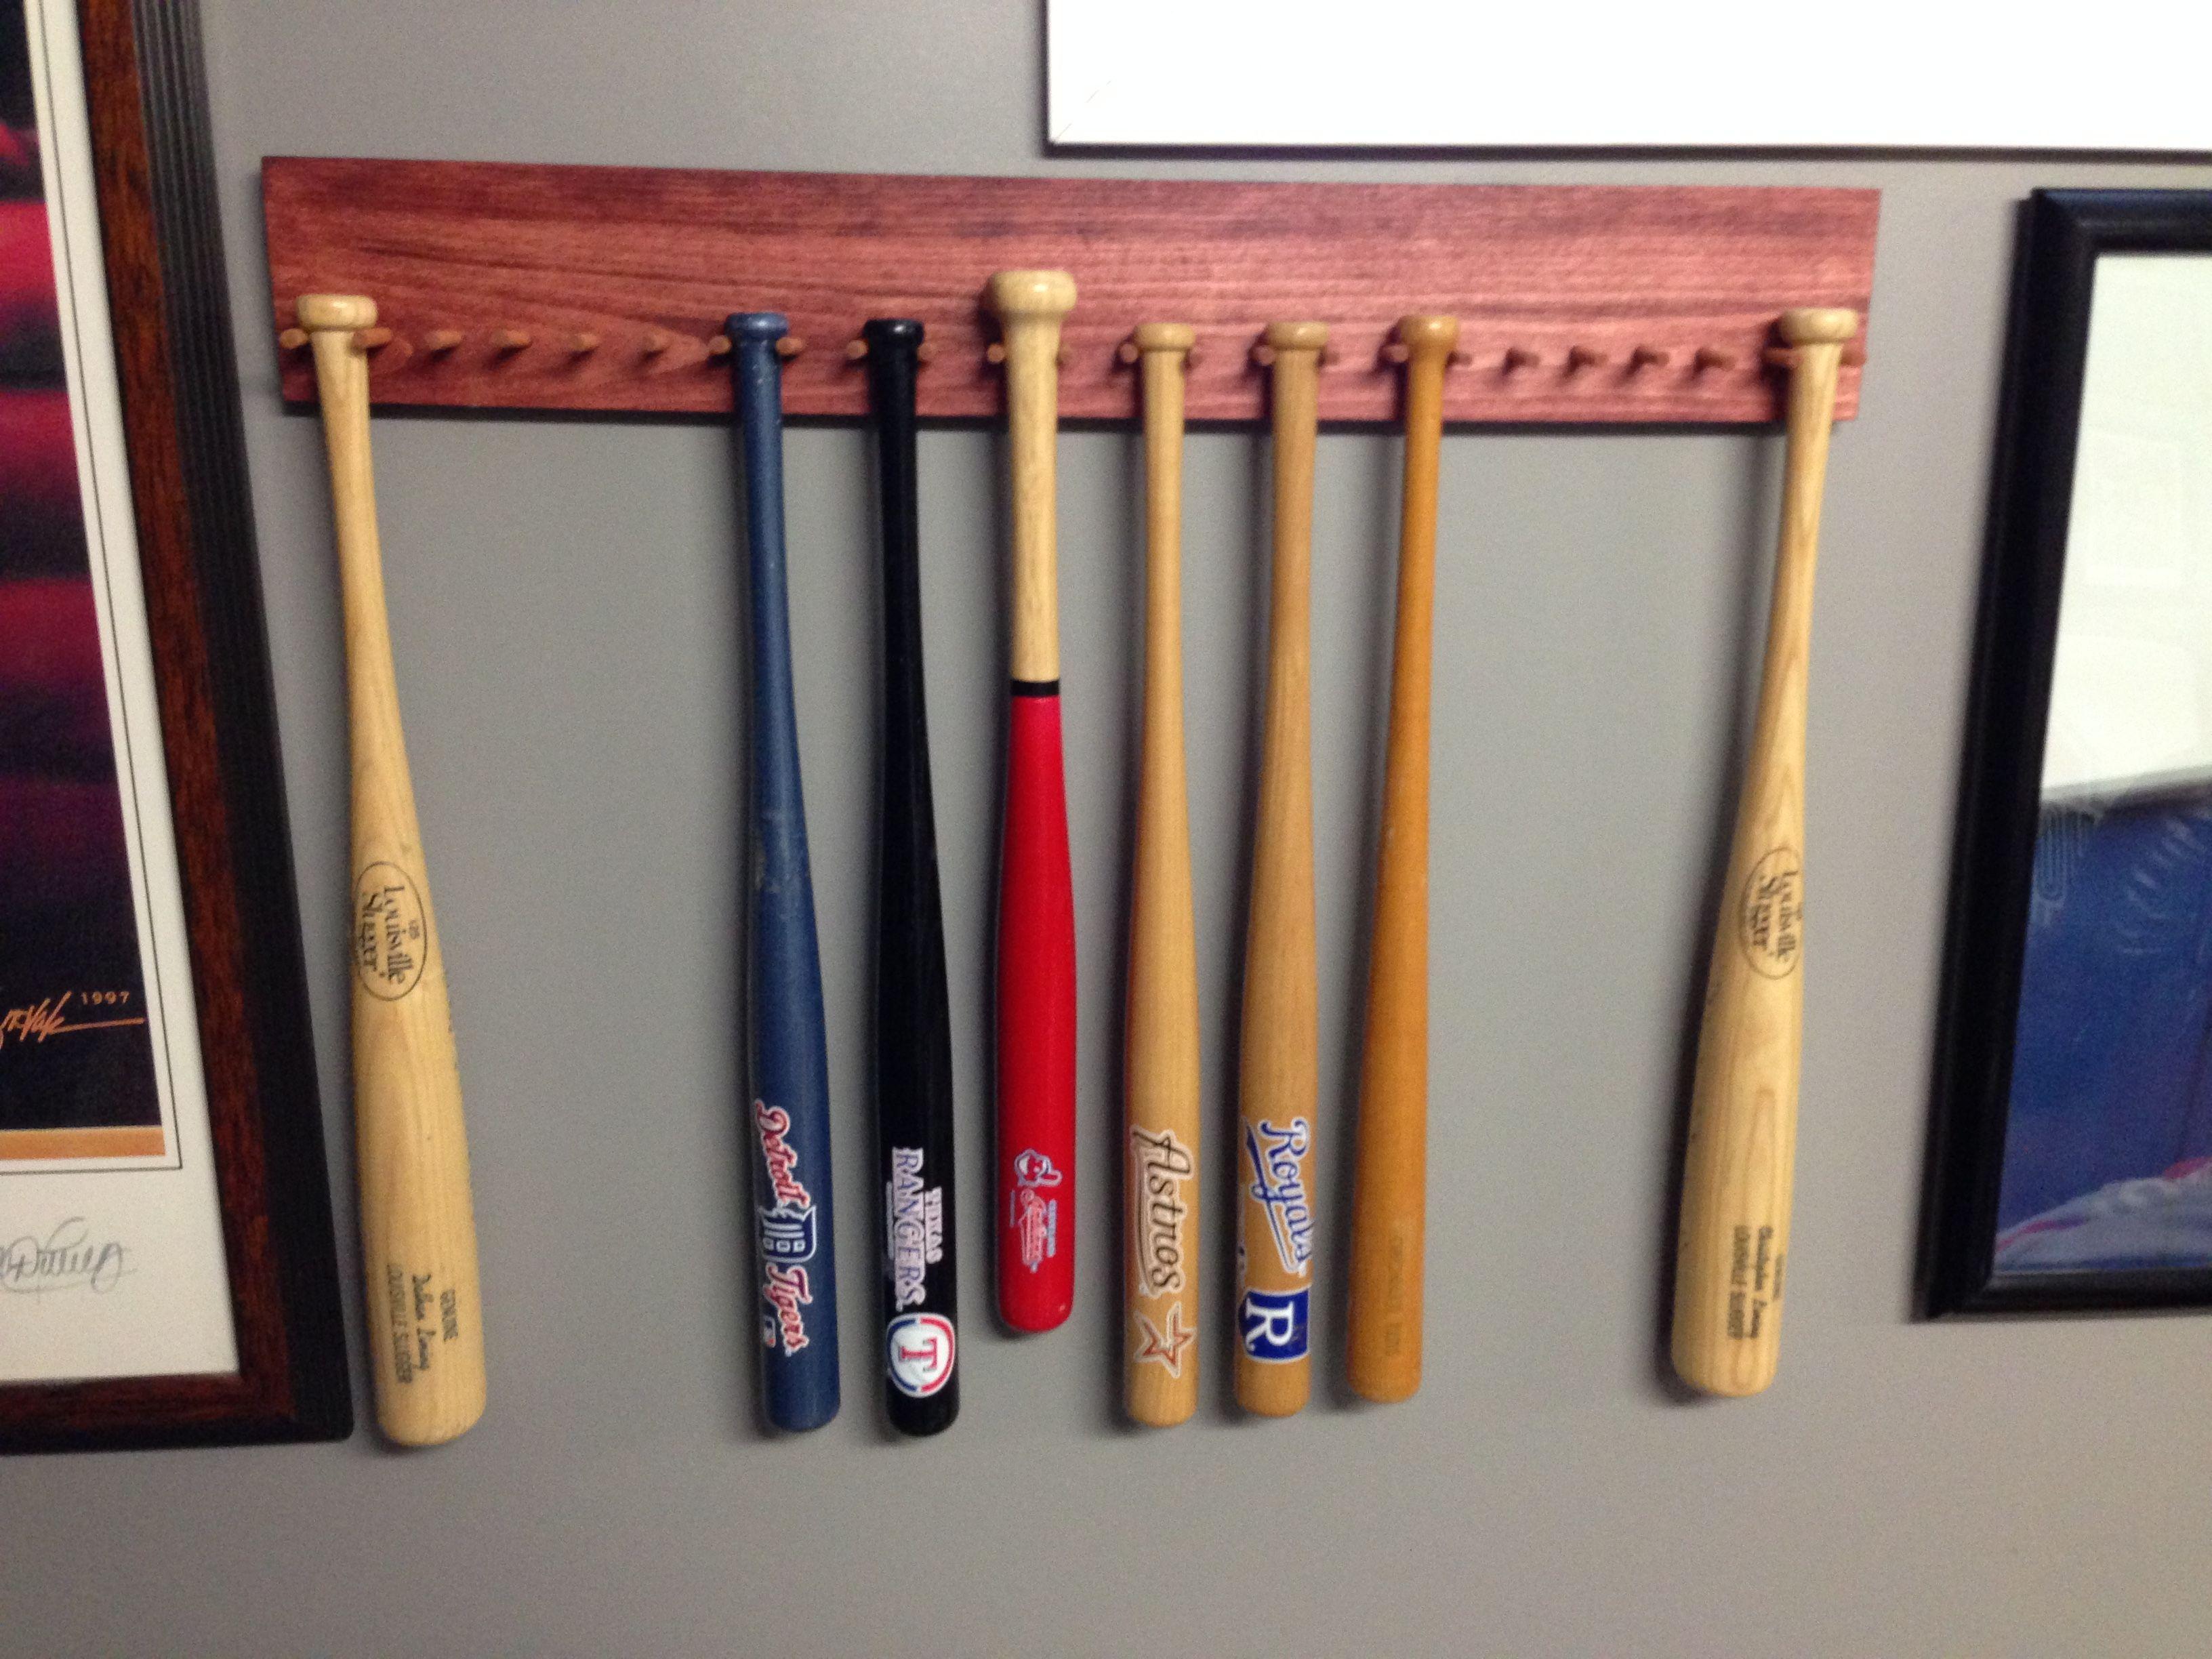 Mini Bat Collectible Display Simple To Make And Hang For Those Collectibles Display Collectible Basebal Bat Display Baseball Bat Display Baseball Bat Rack